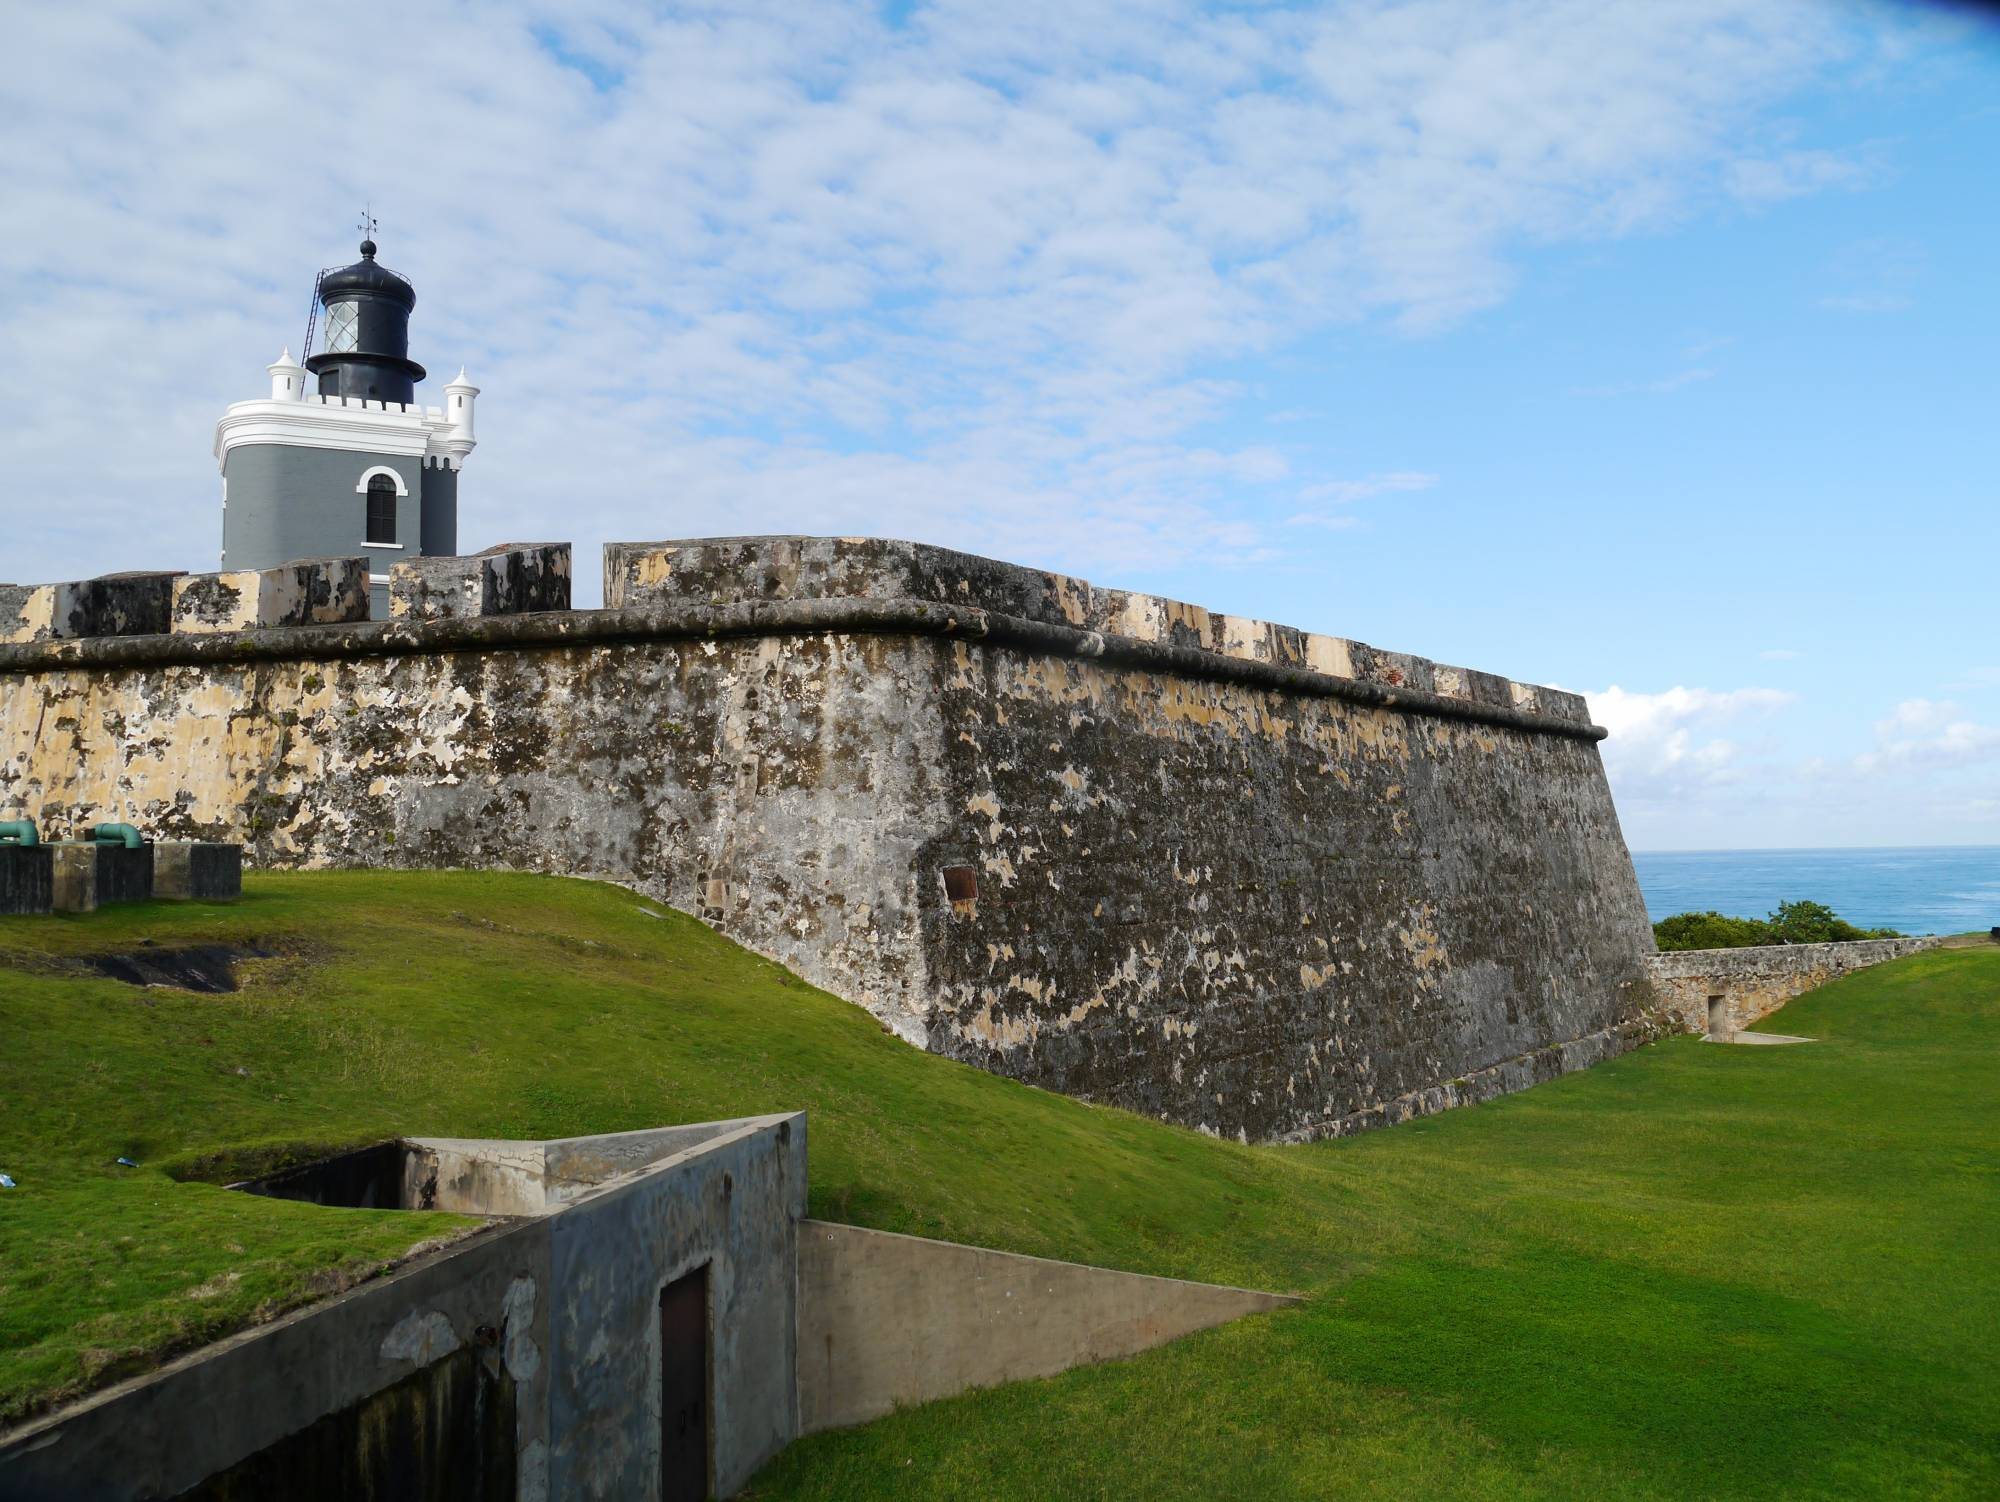 Explore the Disney Cruise Line port or San Juan, Puerto Rico |PassPorter.com